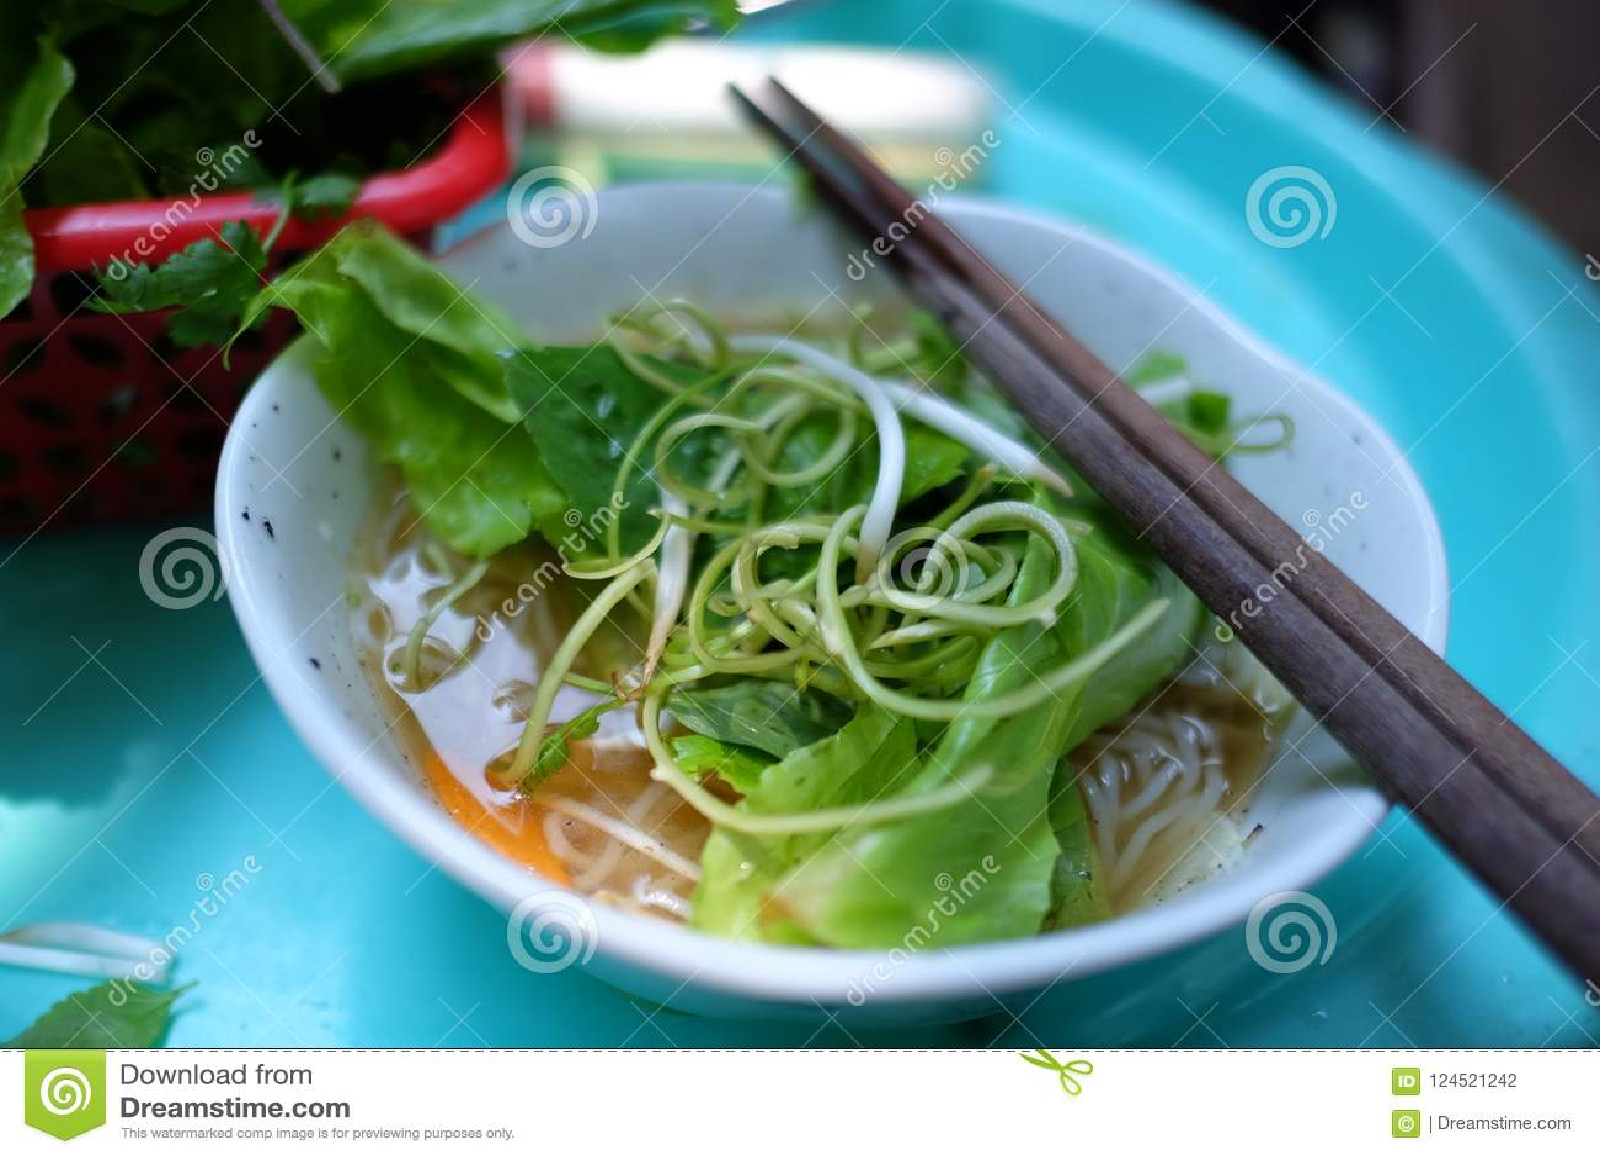 Authentic Vietnamese Street Food Pho Stock Photo - Image of